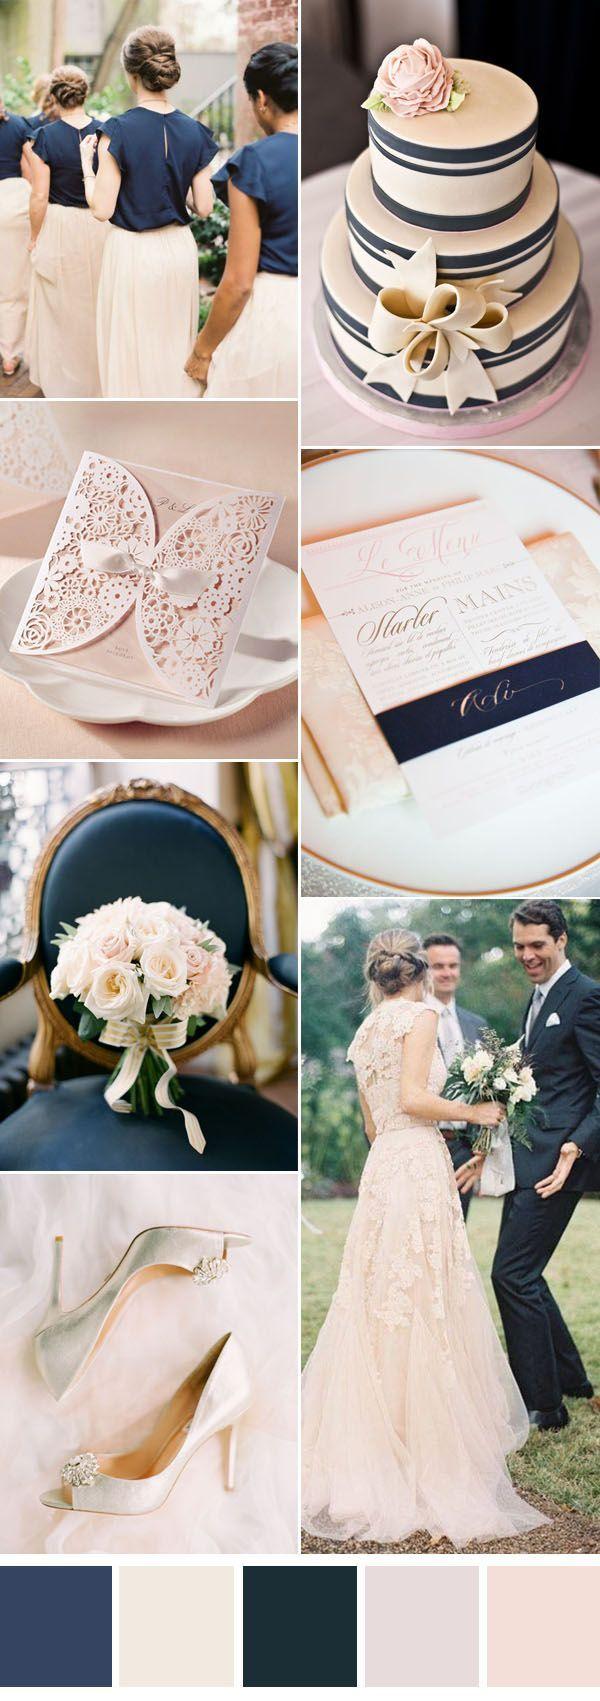 navy blue and blush neutral wedding inspiration